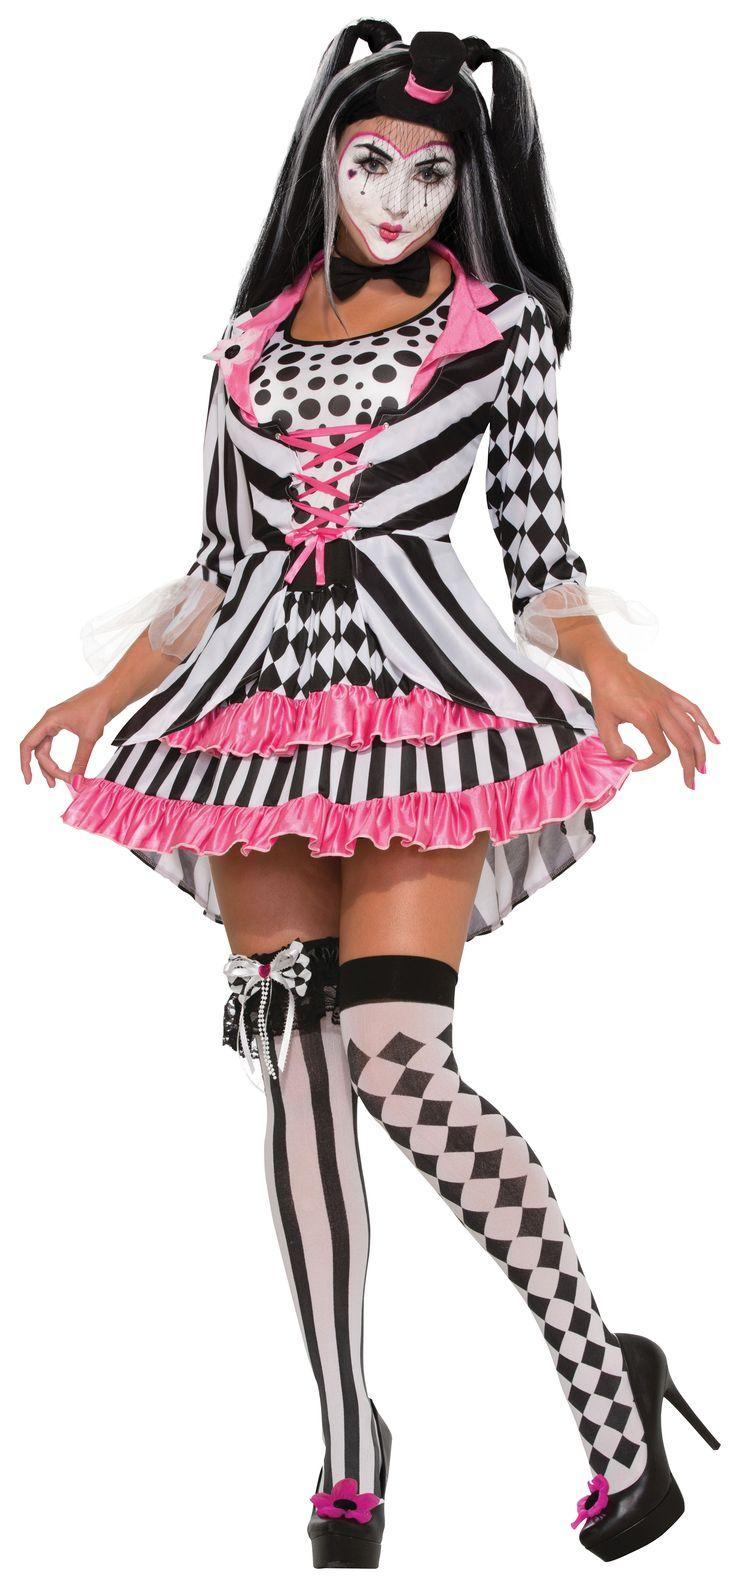 151 best Halloween images on Pinterest | Fancy dress, Woman ...